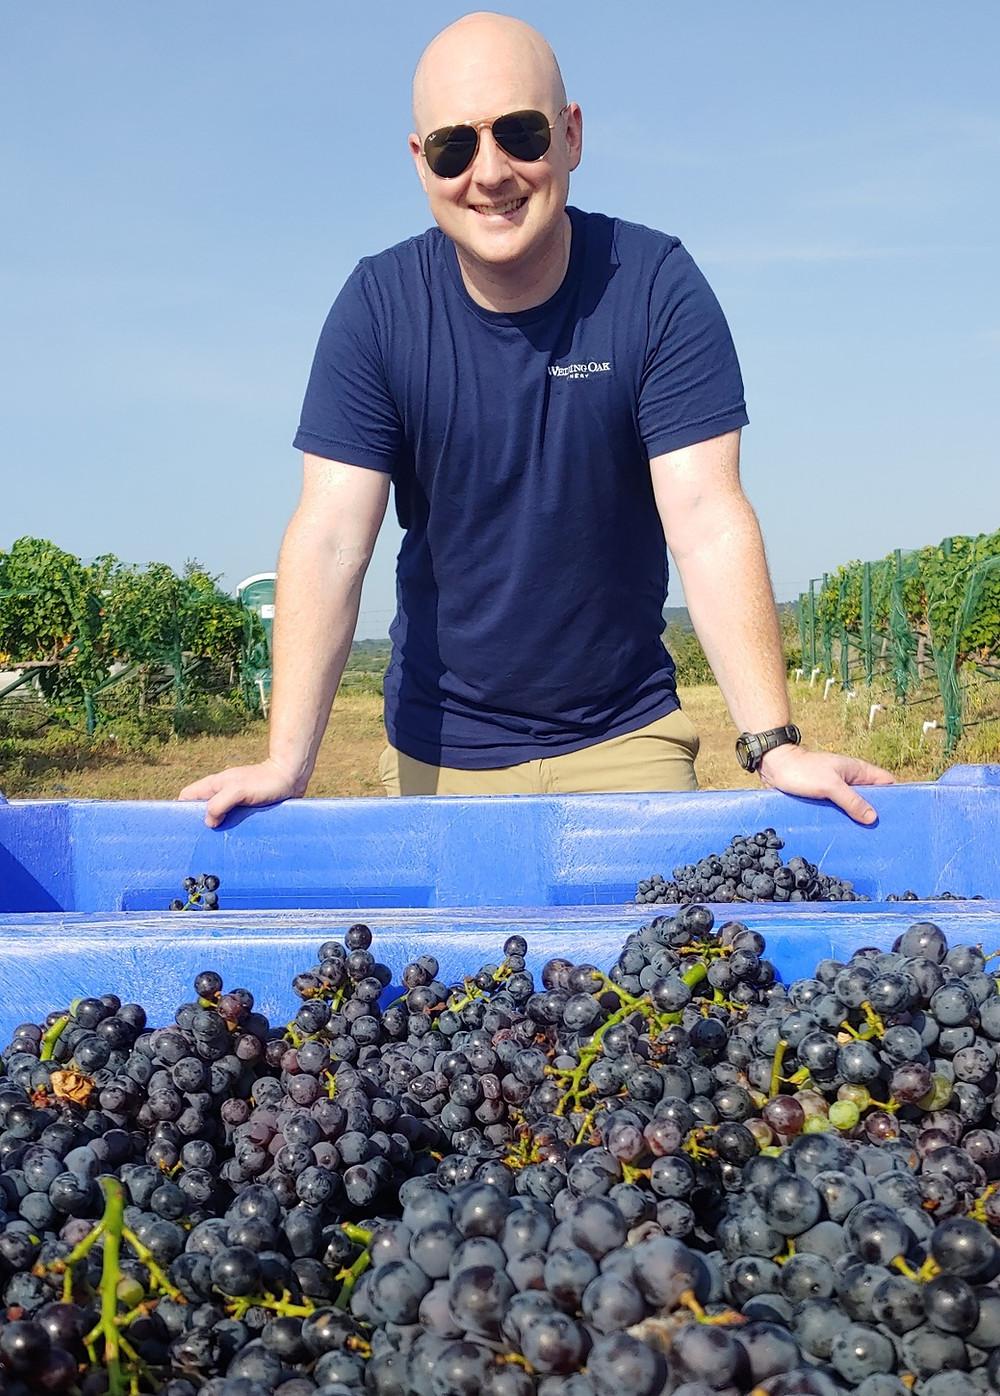 Seth Urbanek, Wedding Oak Winery